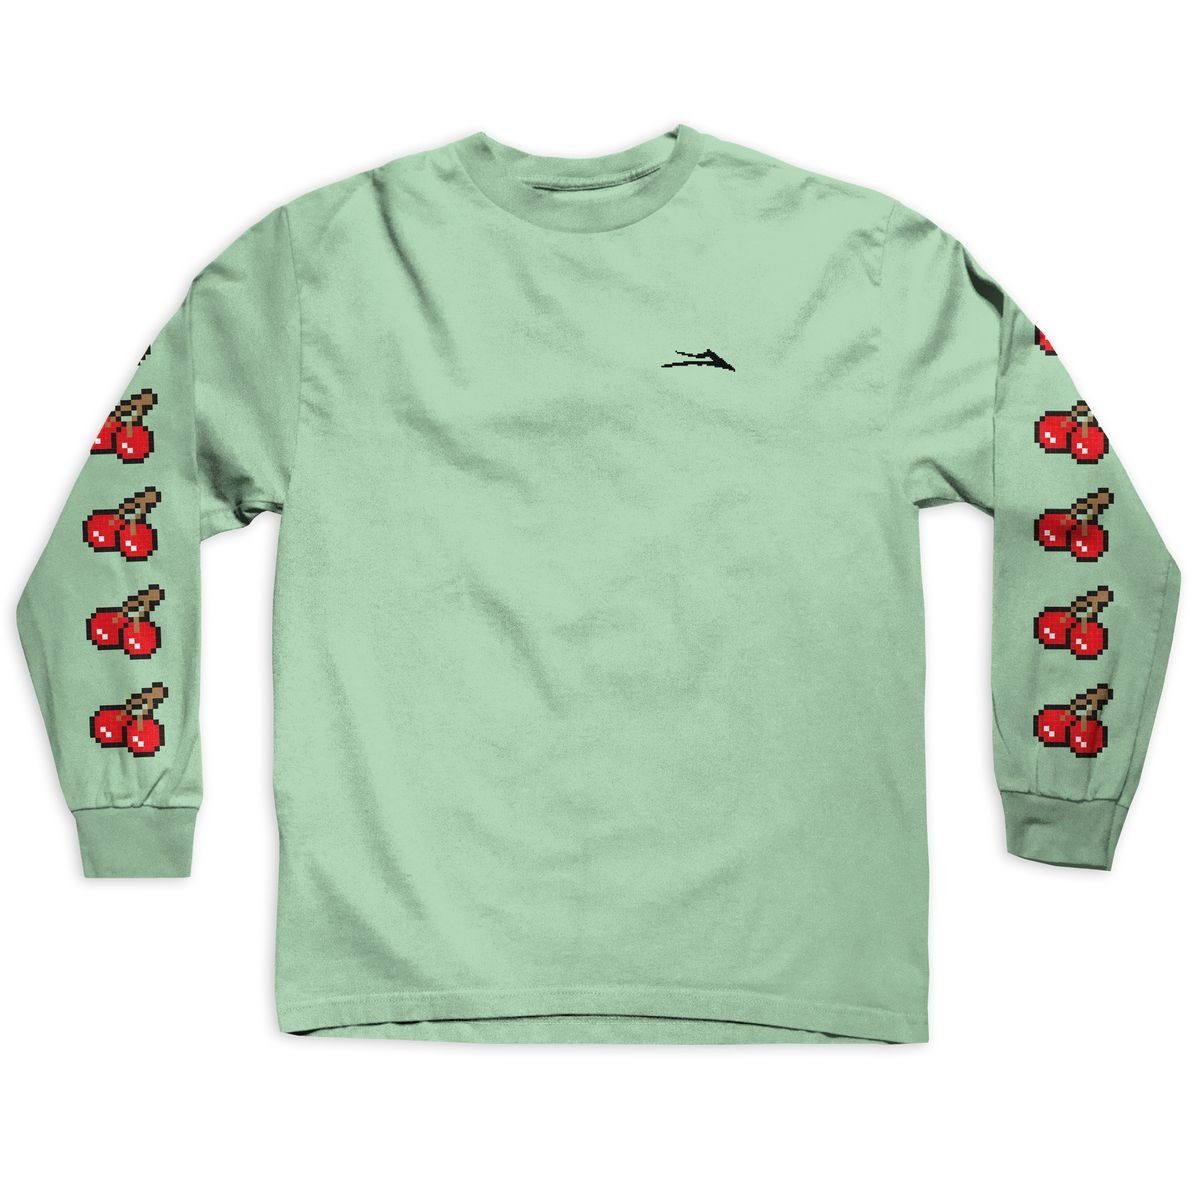 Lakai 8 Bit Long Sleeve t shirt celadon